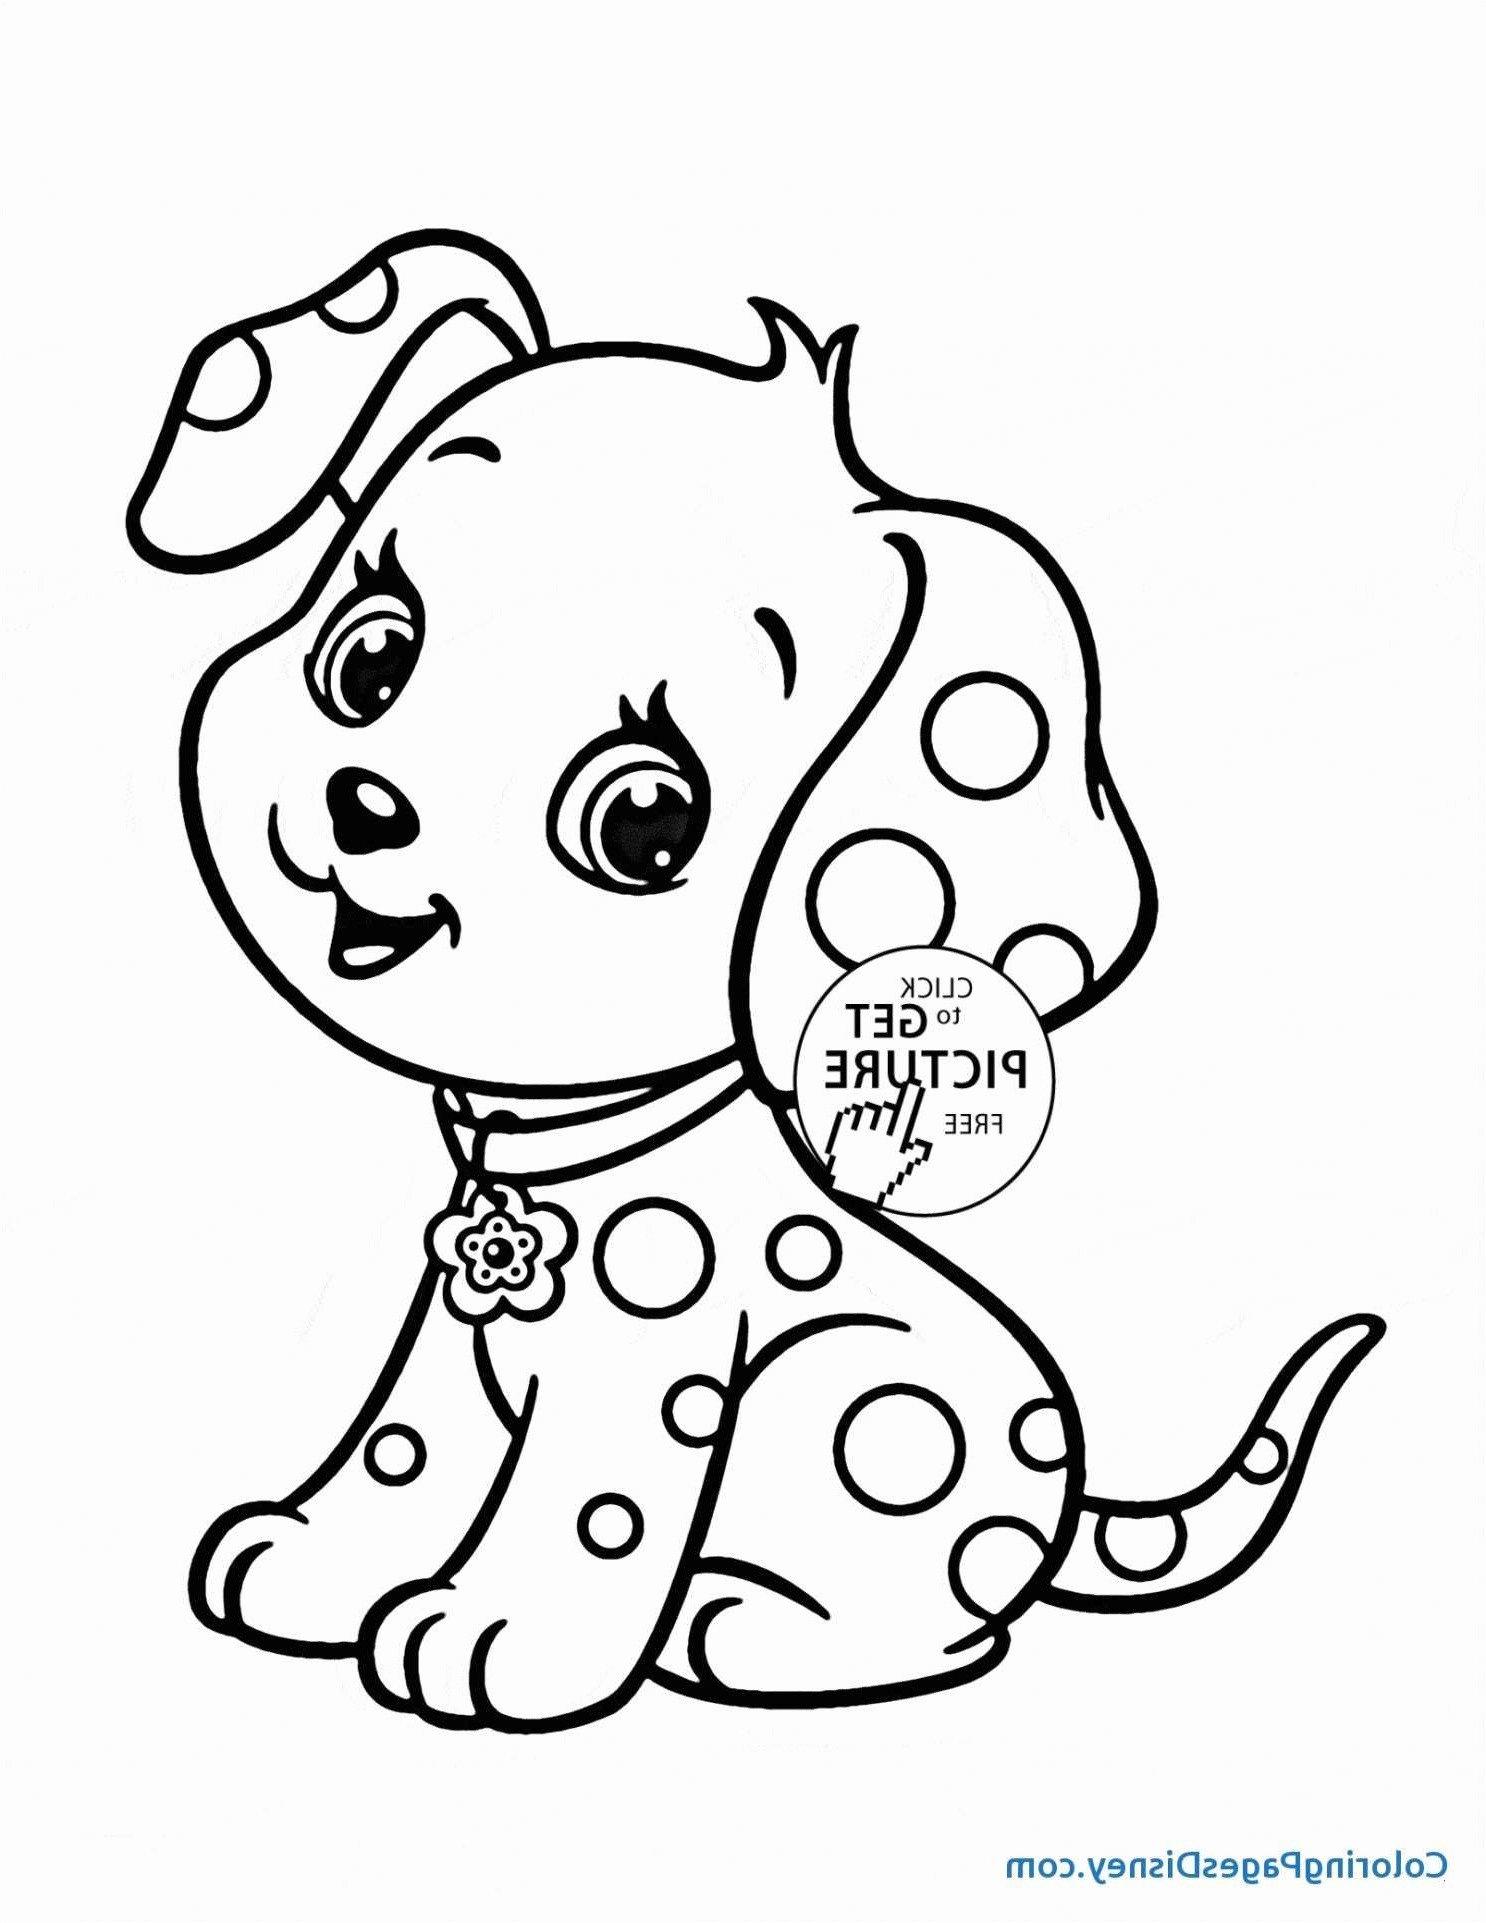 Printable Coloring Worksheets for Preschoolers Best Of Coloring Pages Free Printable Coloring Pages for